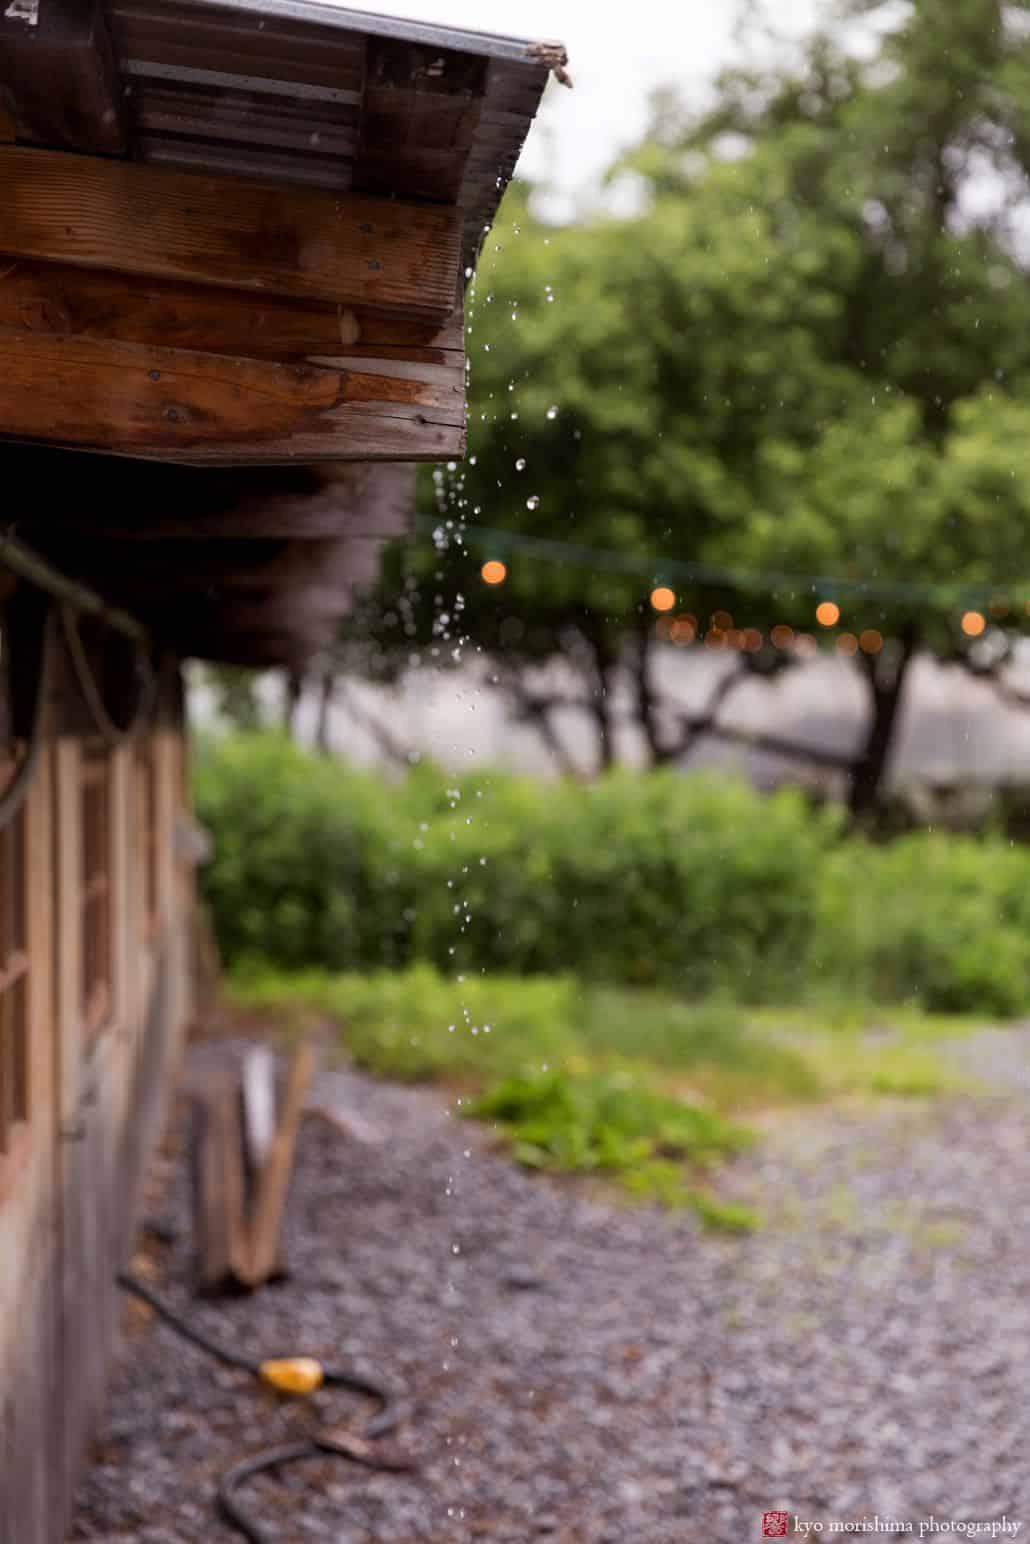 rain drops fall and splash from tin rooftop onto gravel path at Blooming Hill Farm wedding. New York wedding photographer. Rain wedding day photos.